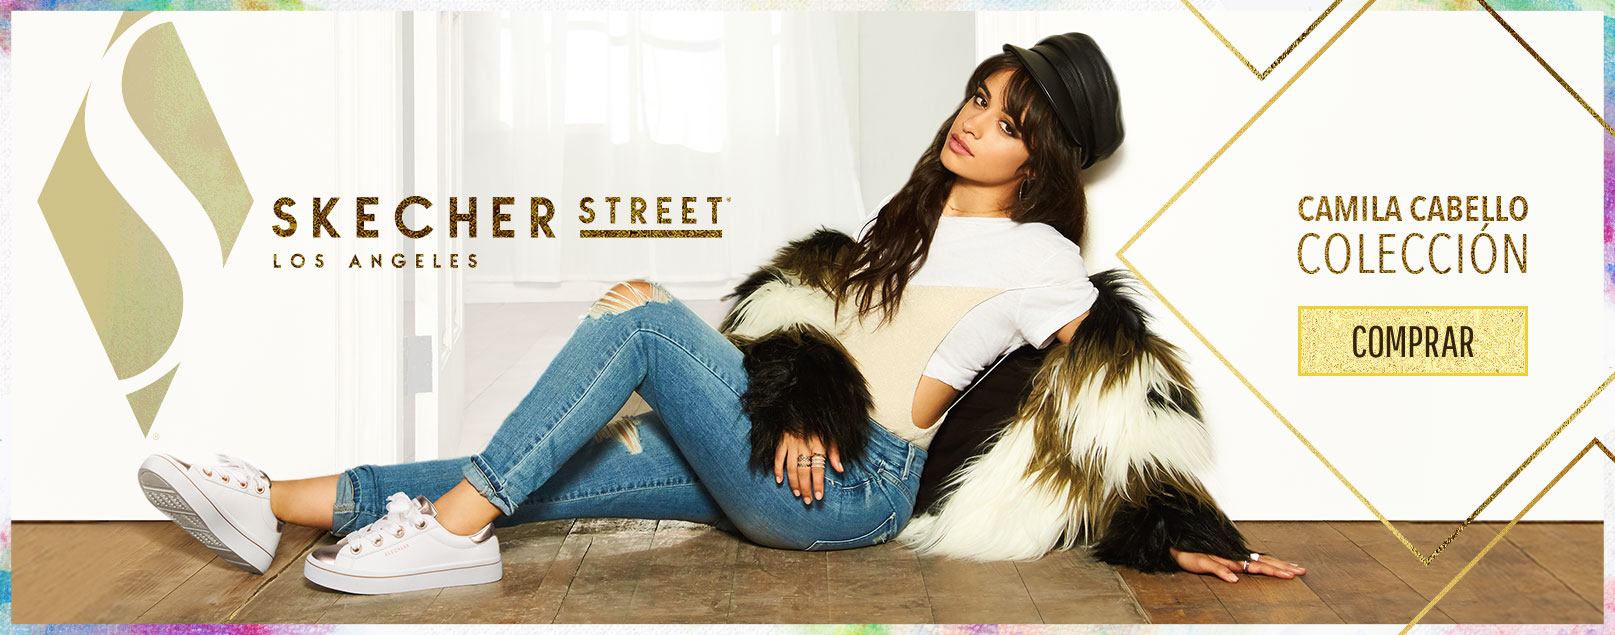 Skechers Street Camila Cabello